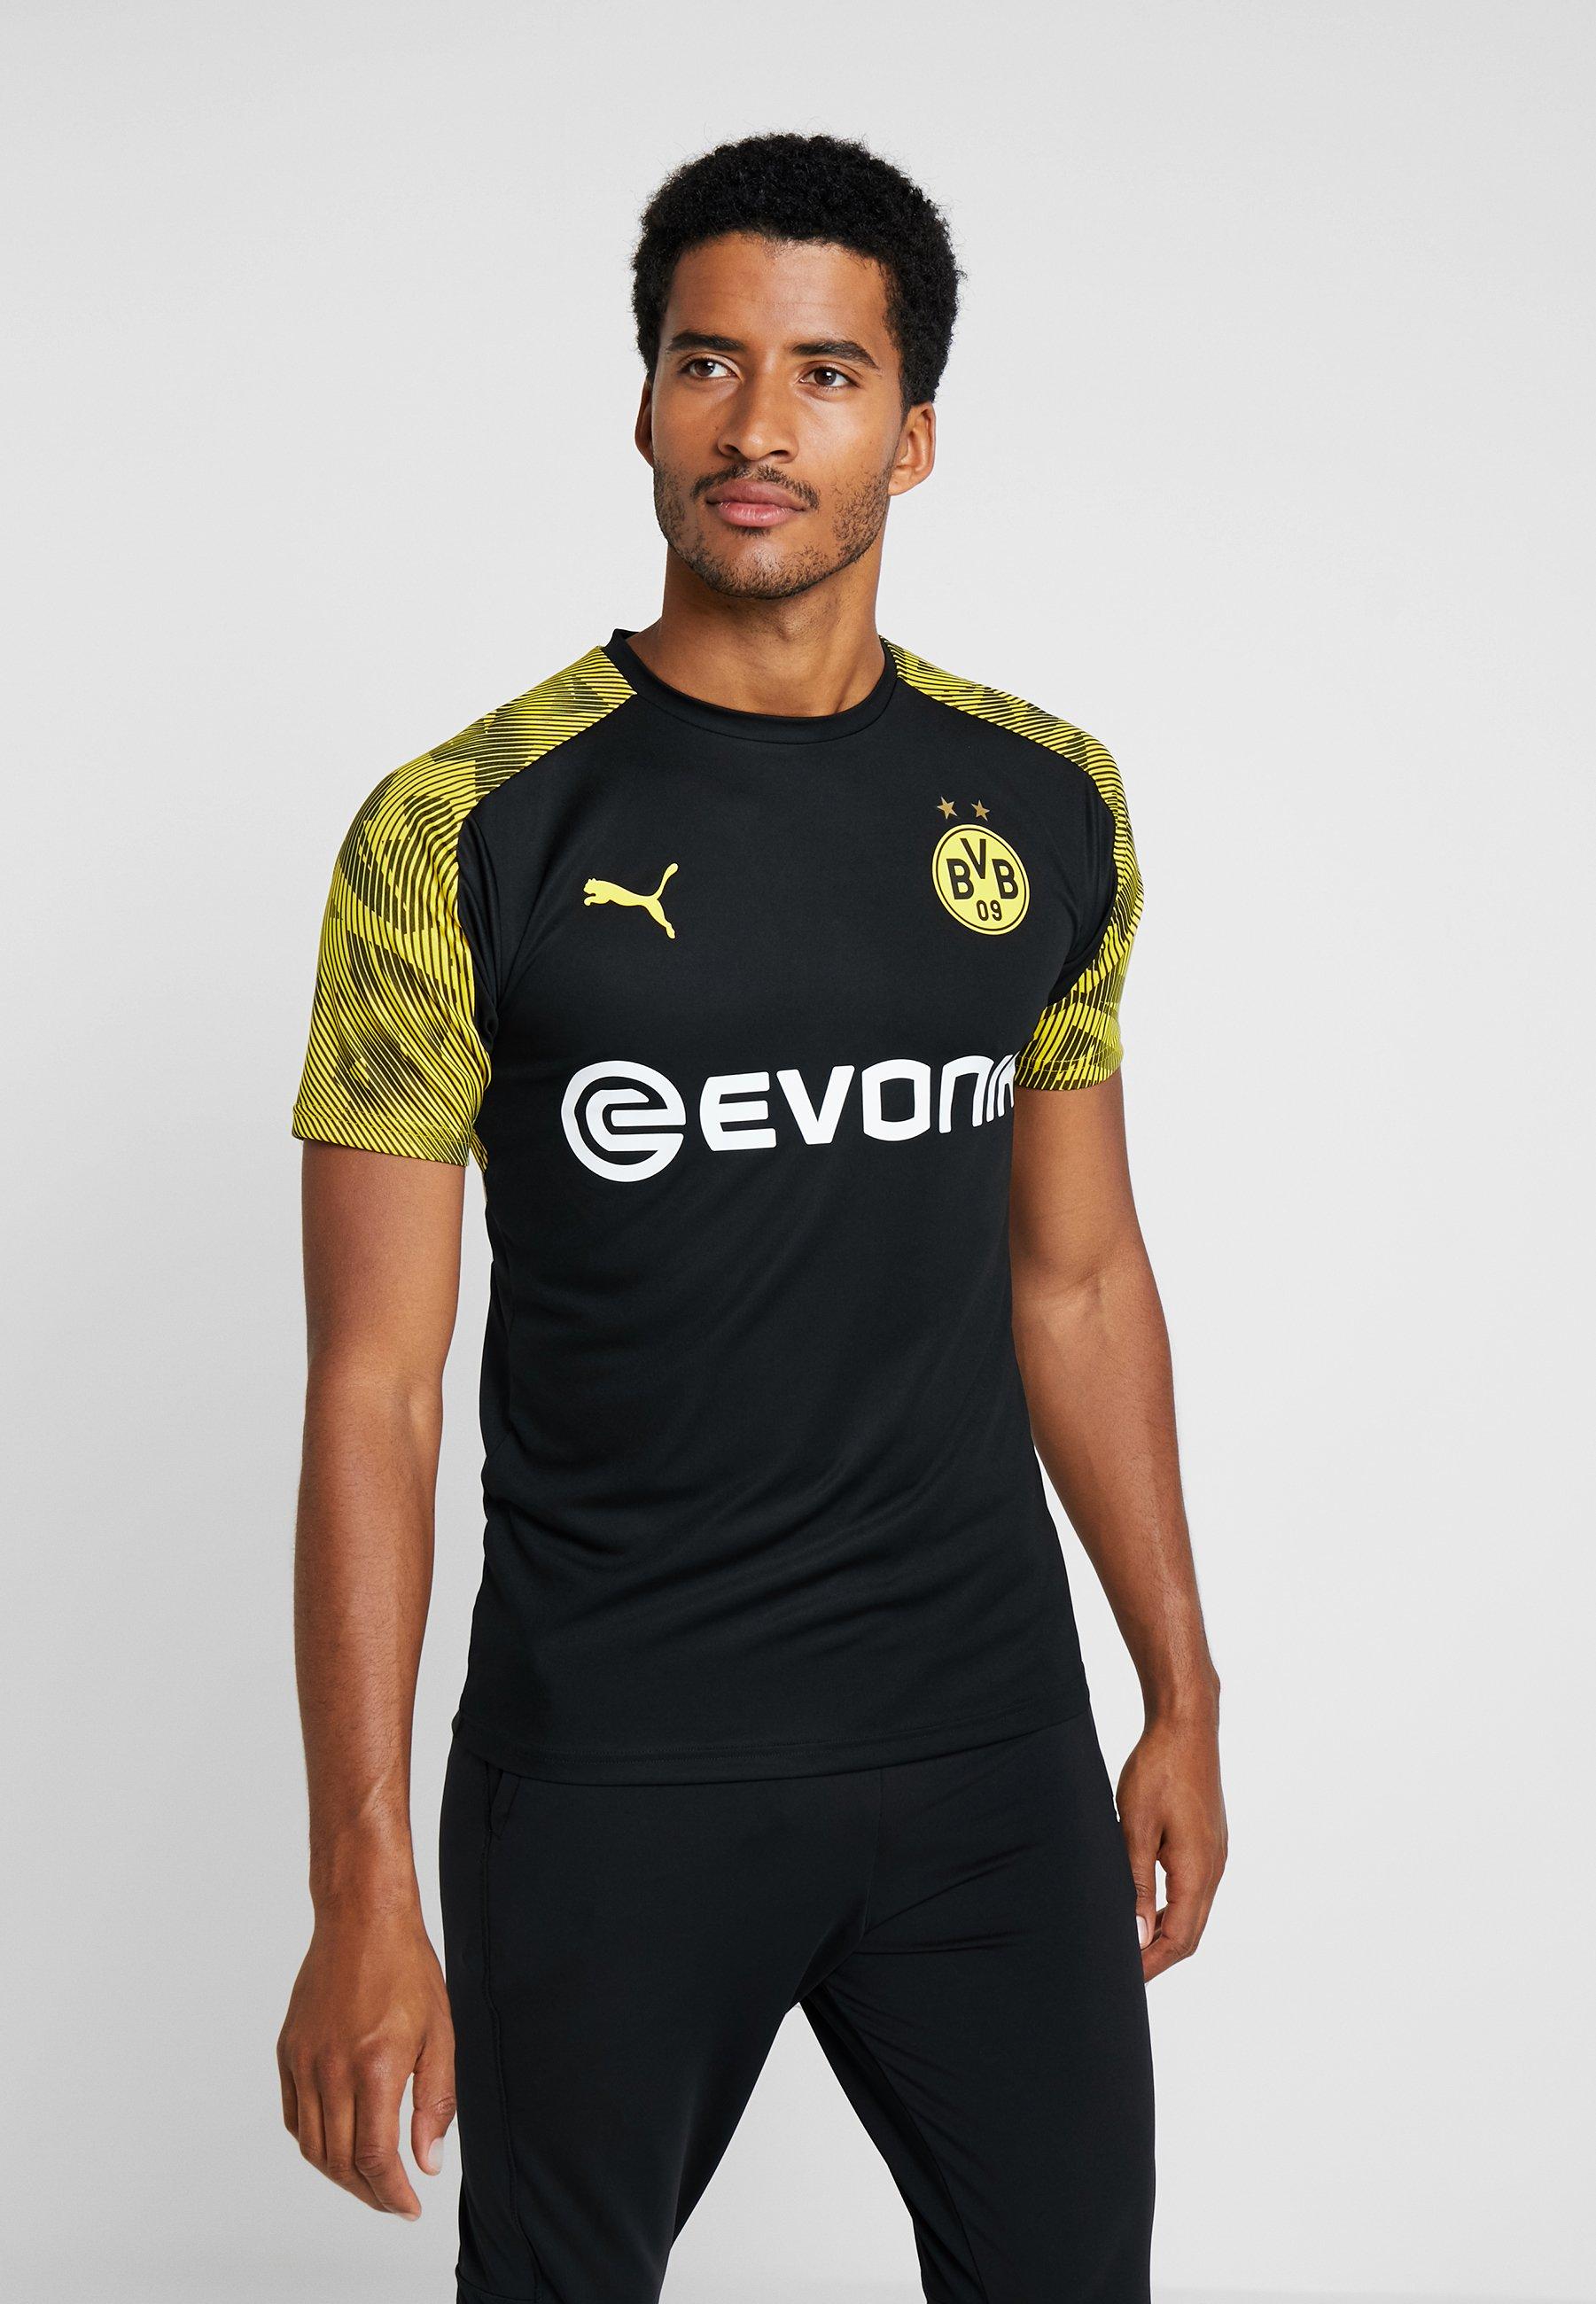 Black Dortmund De Evonik Supporter cyber LogoArticle Borussia Yellow Training With Puma Bvb 35RjL4A